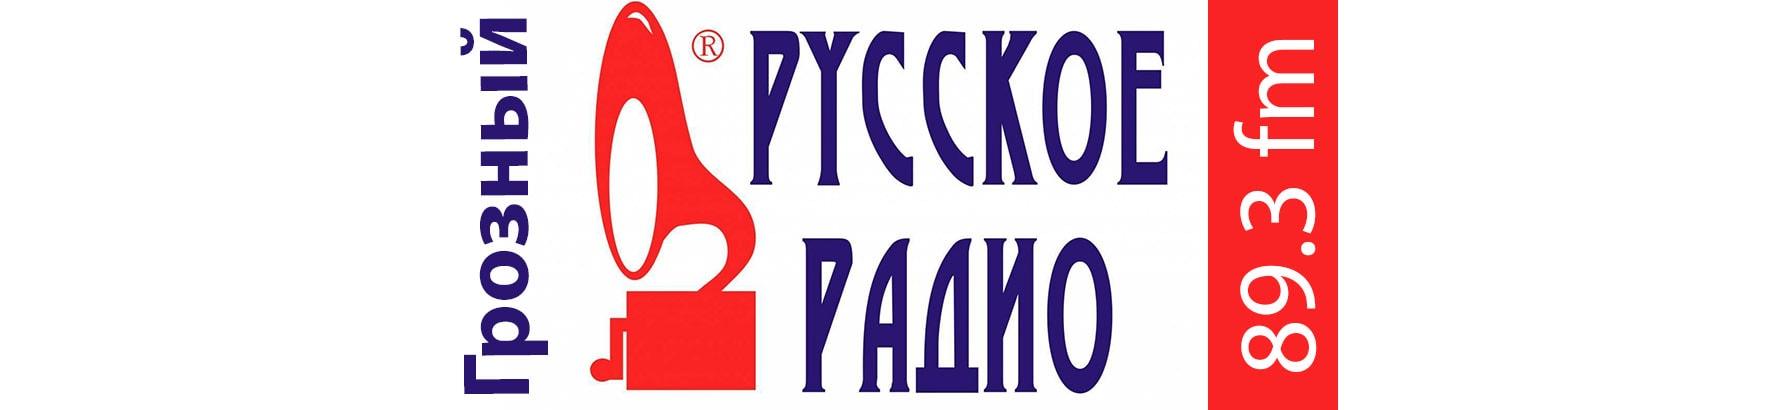 Реклама на радио в Чечне Русское радио